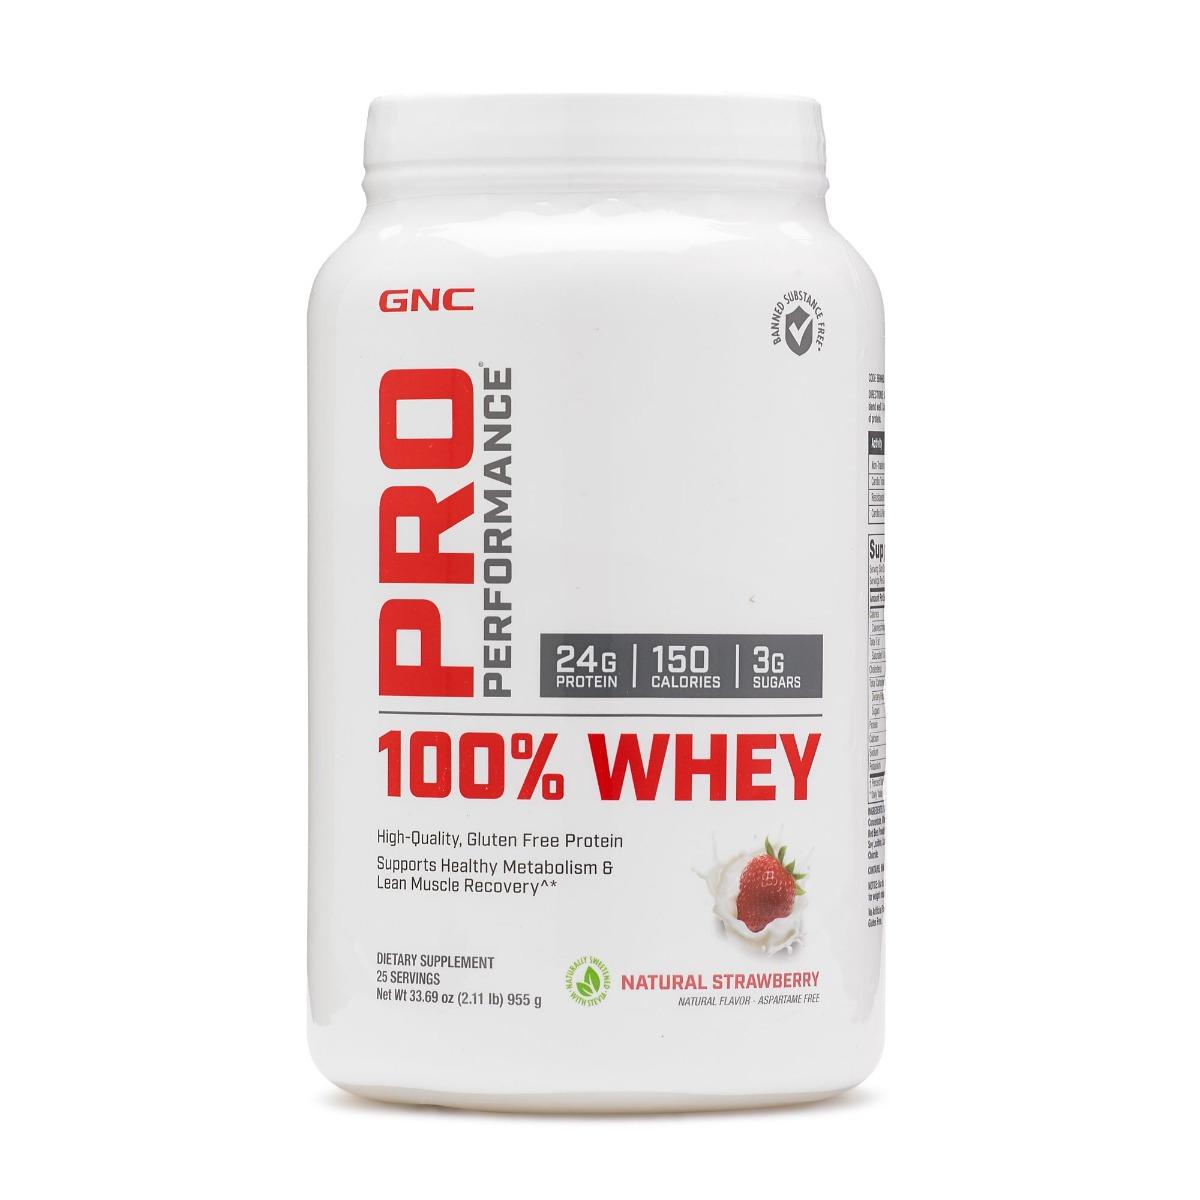 Proteina din zer cu aroma naturala de capsuni Pro Performance, 955g, GNC imagine 2021 drmax.ro